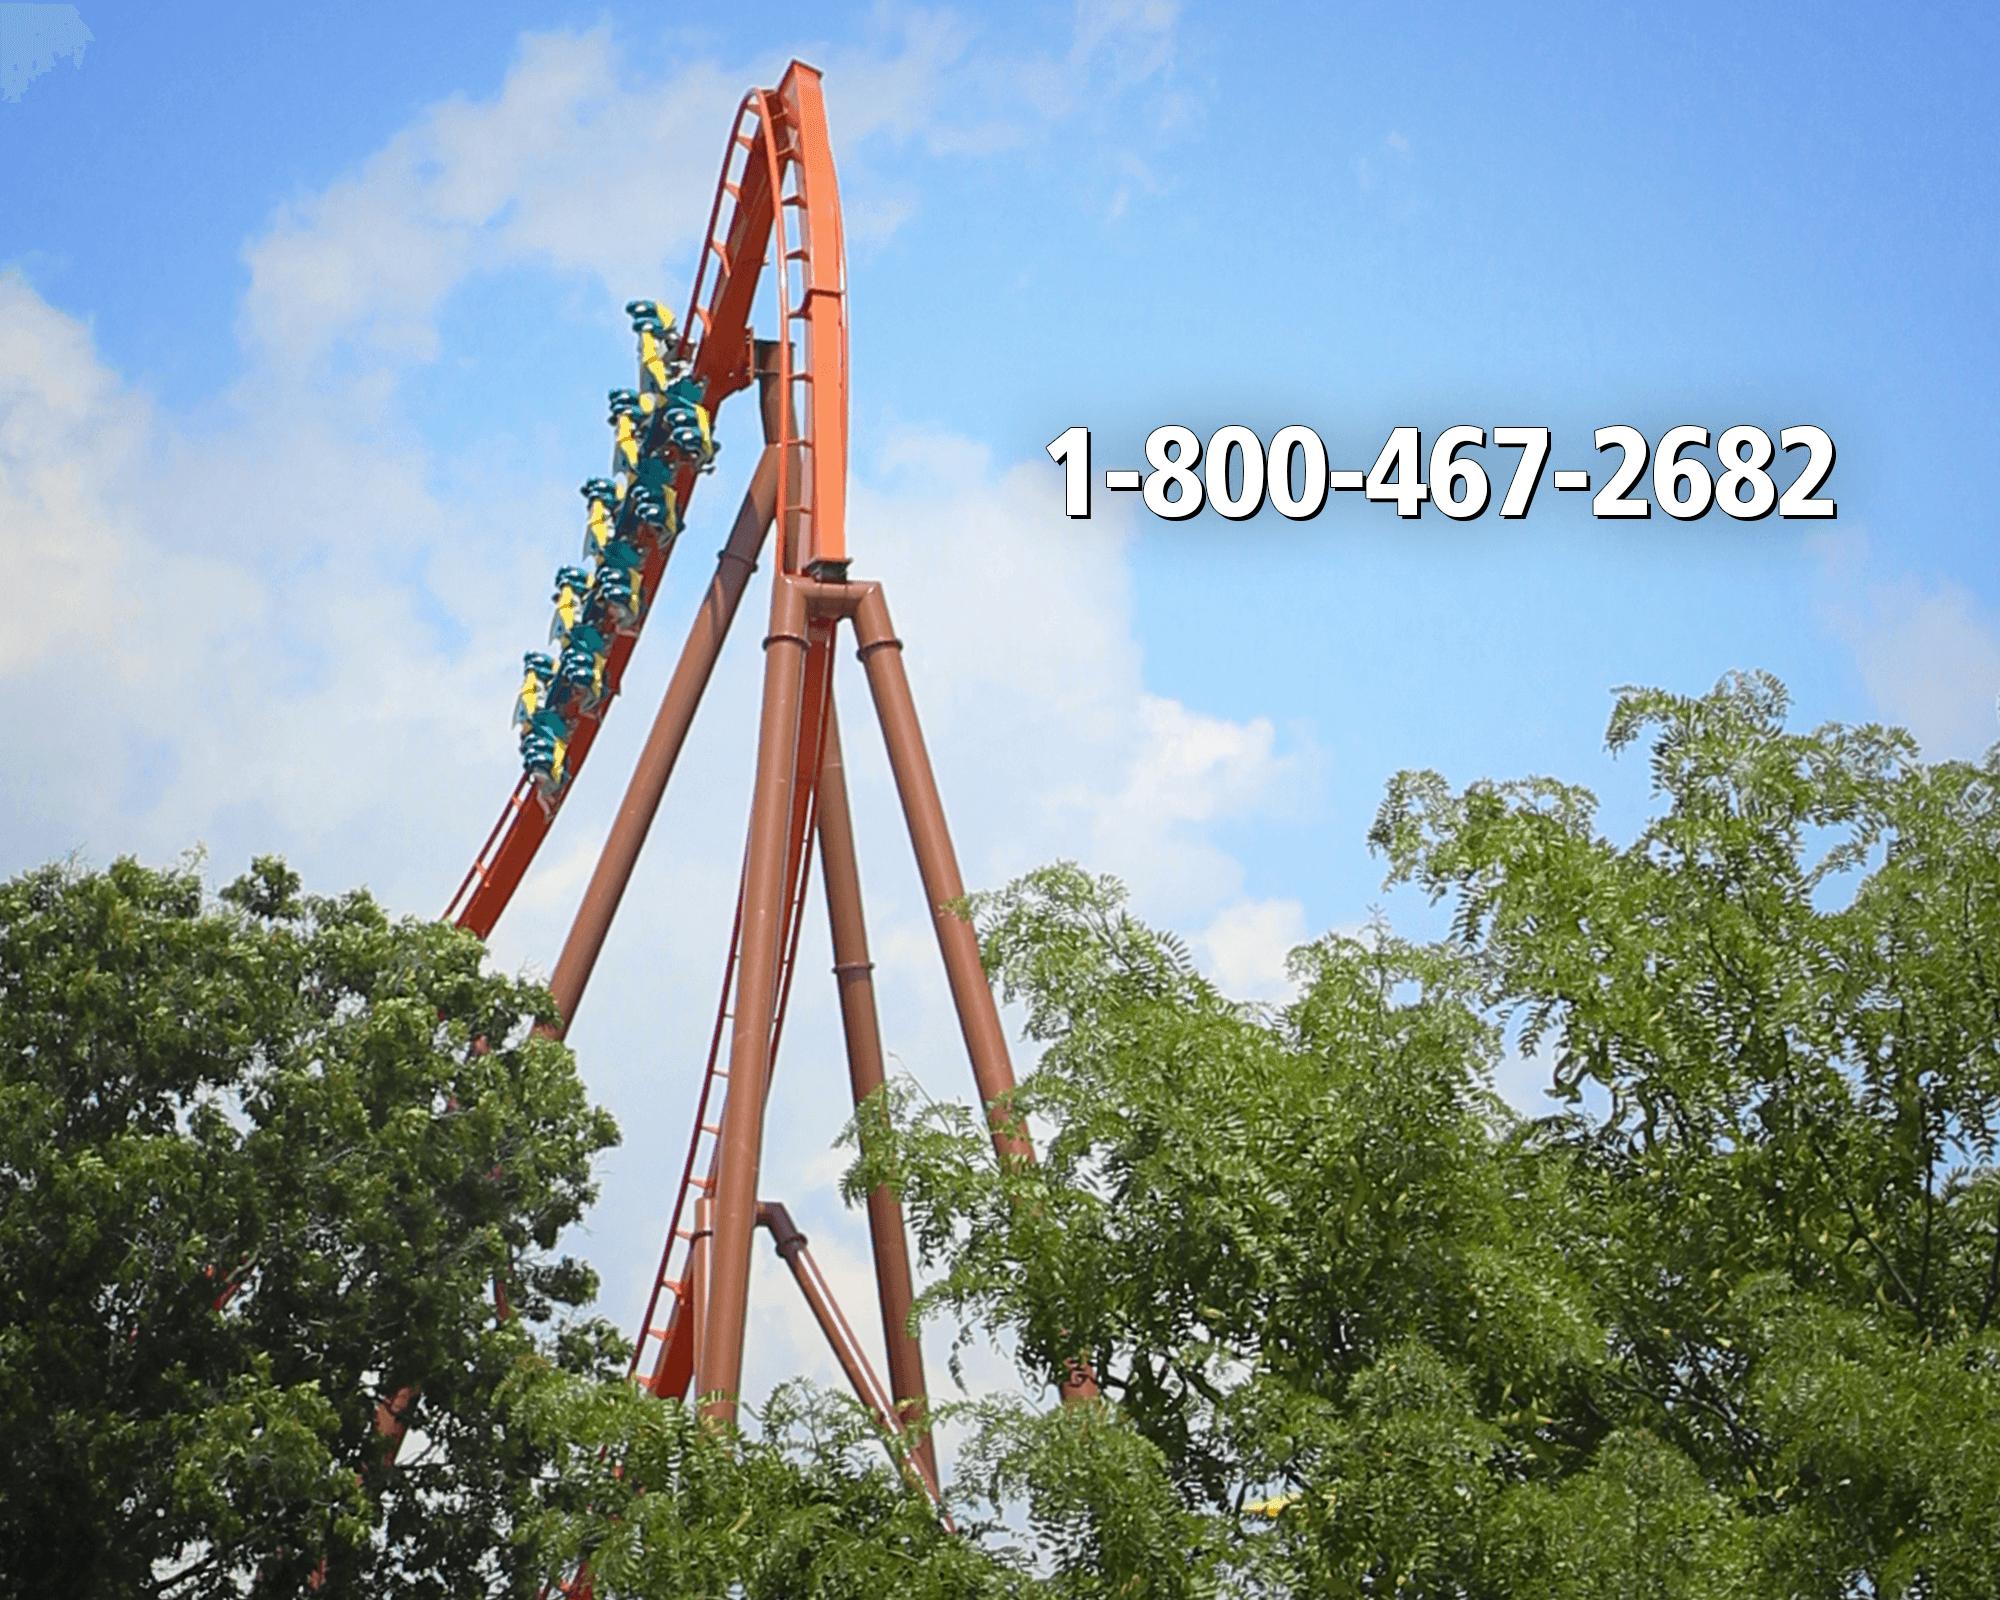 Call Today! 1-800-467-2682 | Holiday World & Splashin' Safari